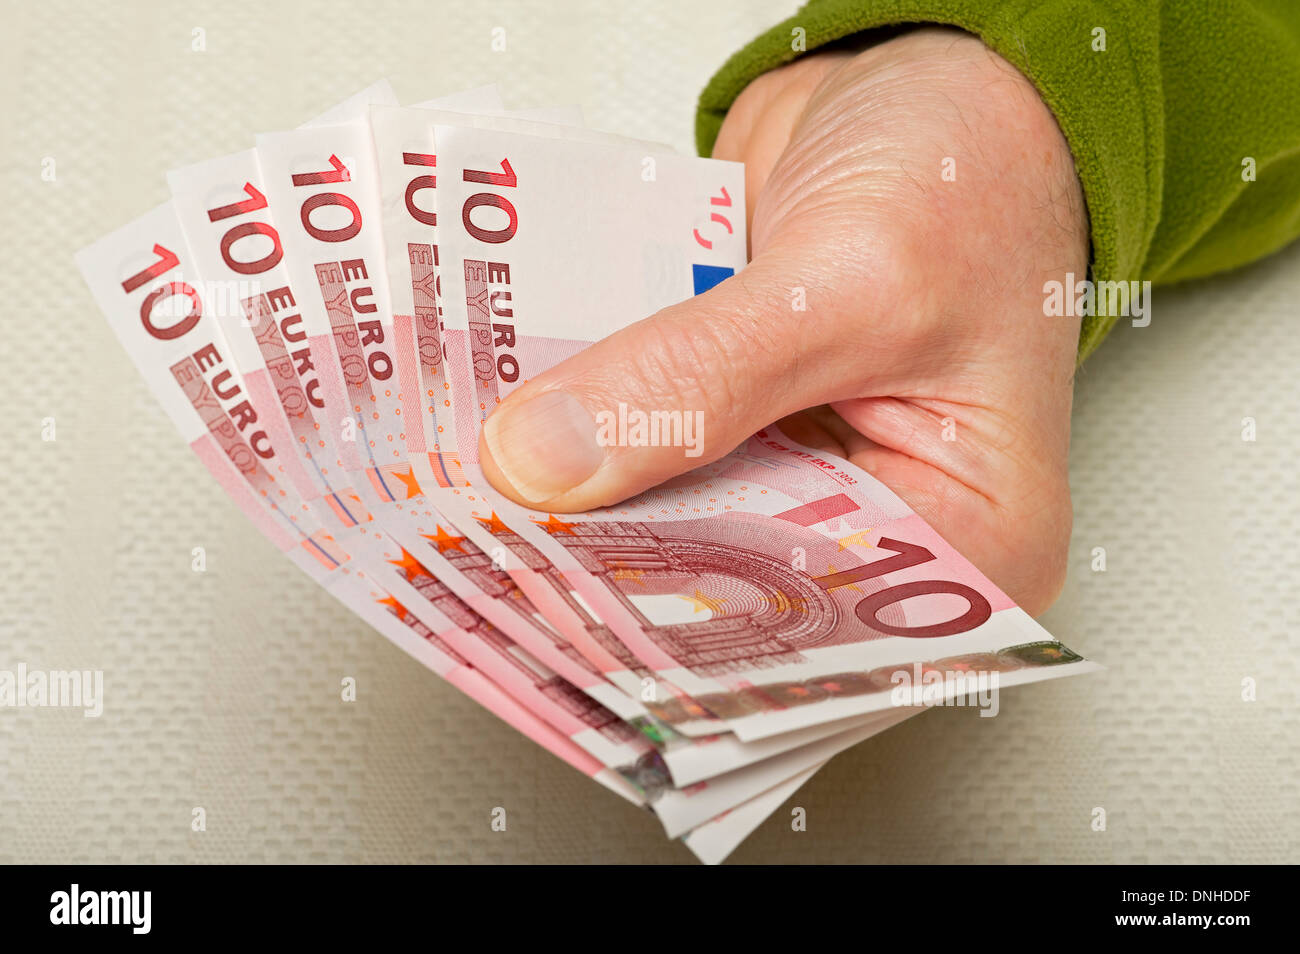 Hand holding 10 Euro notes - Stock Image